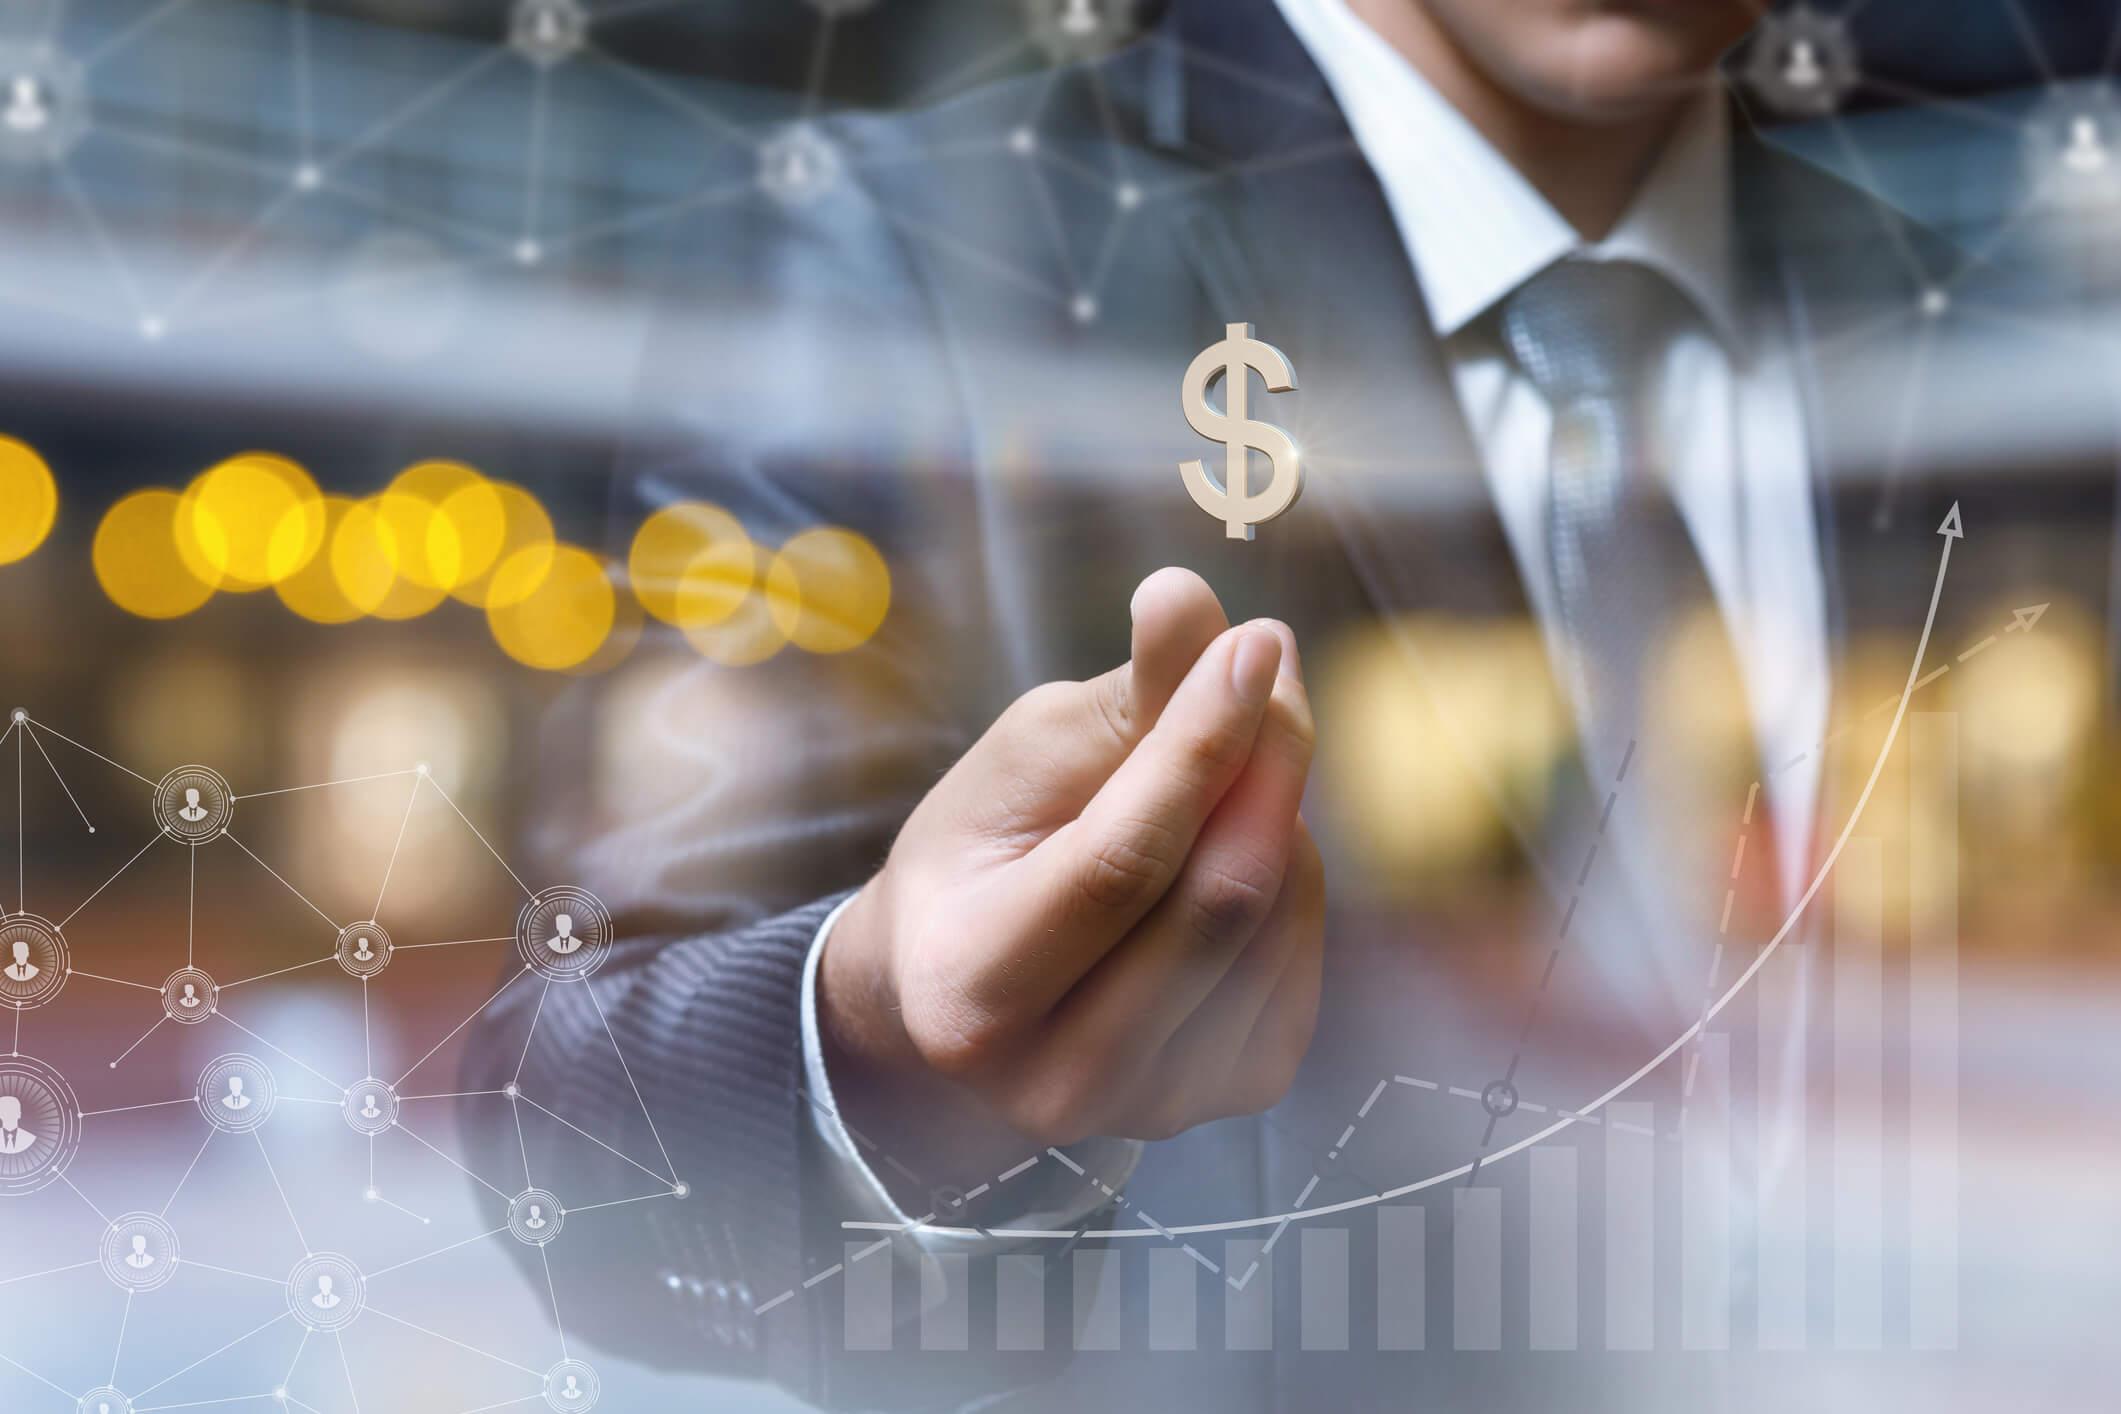 funding strategies - Complete Controller